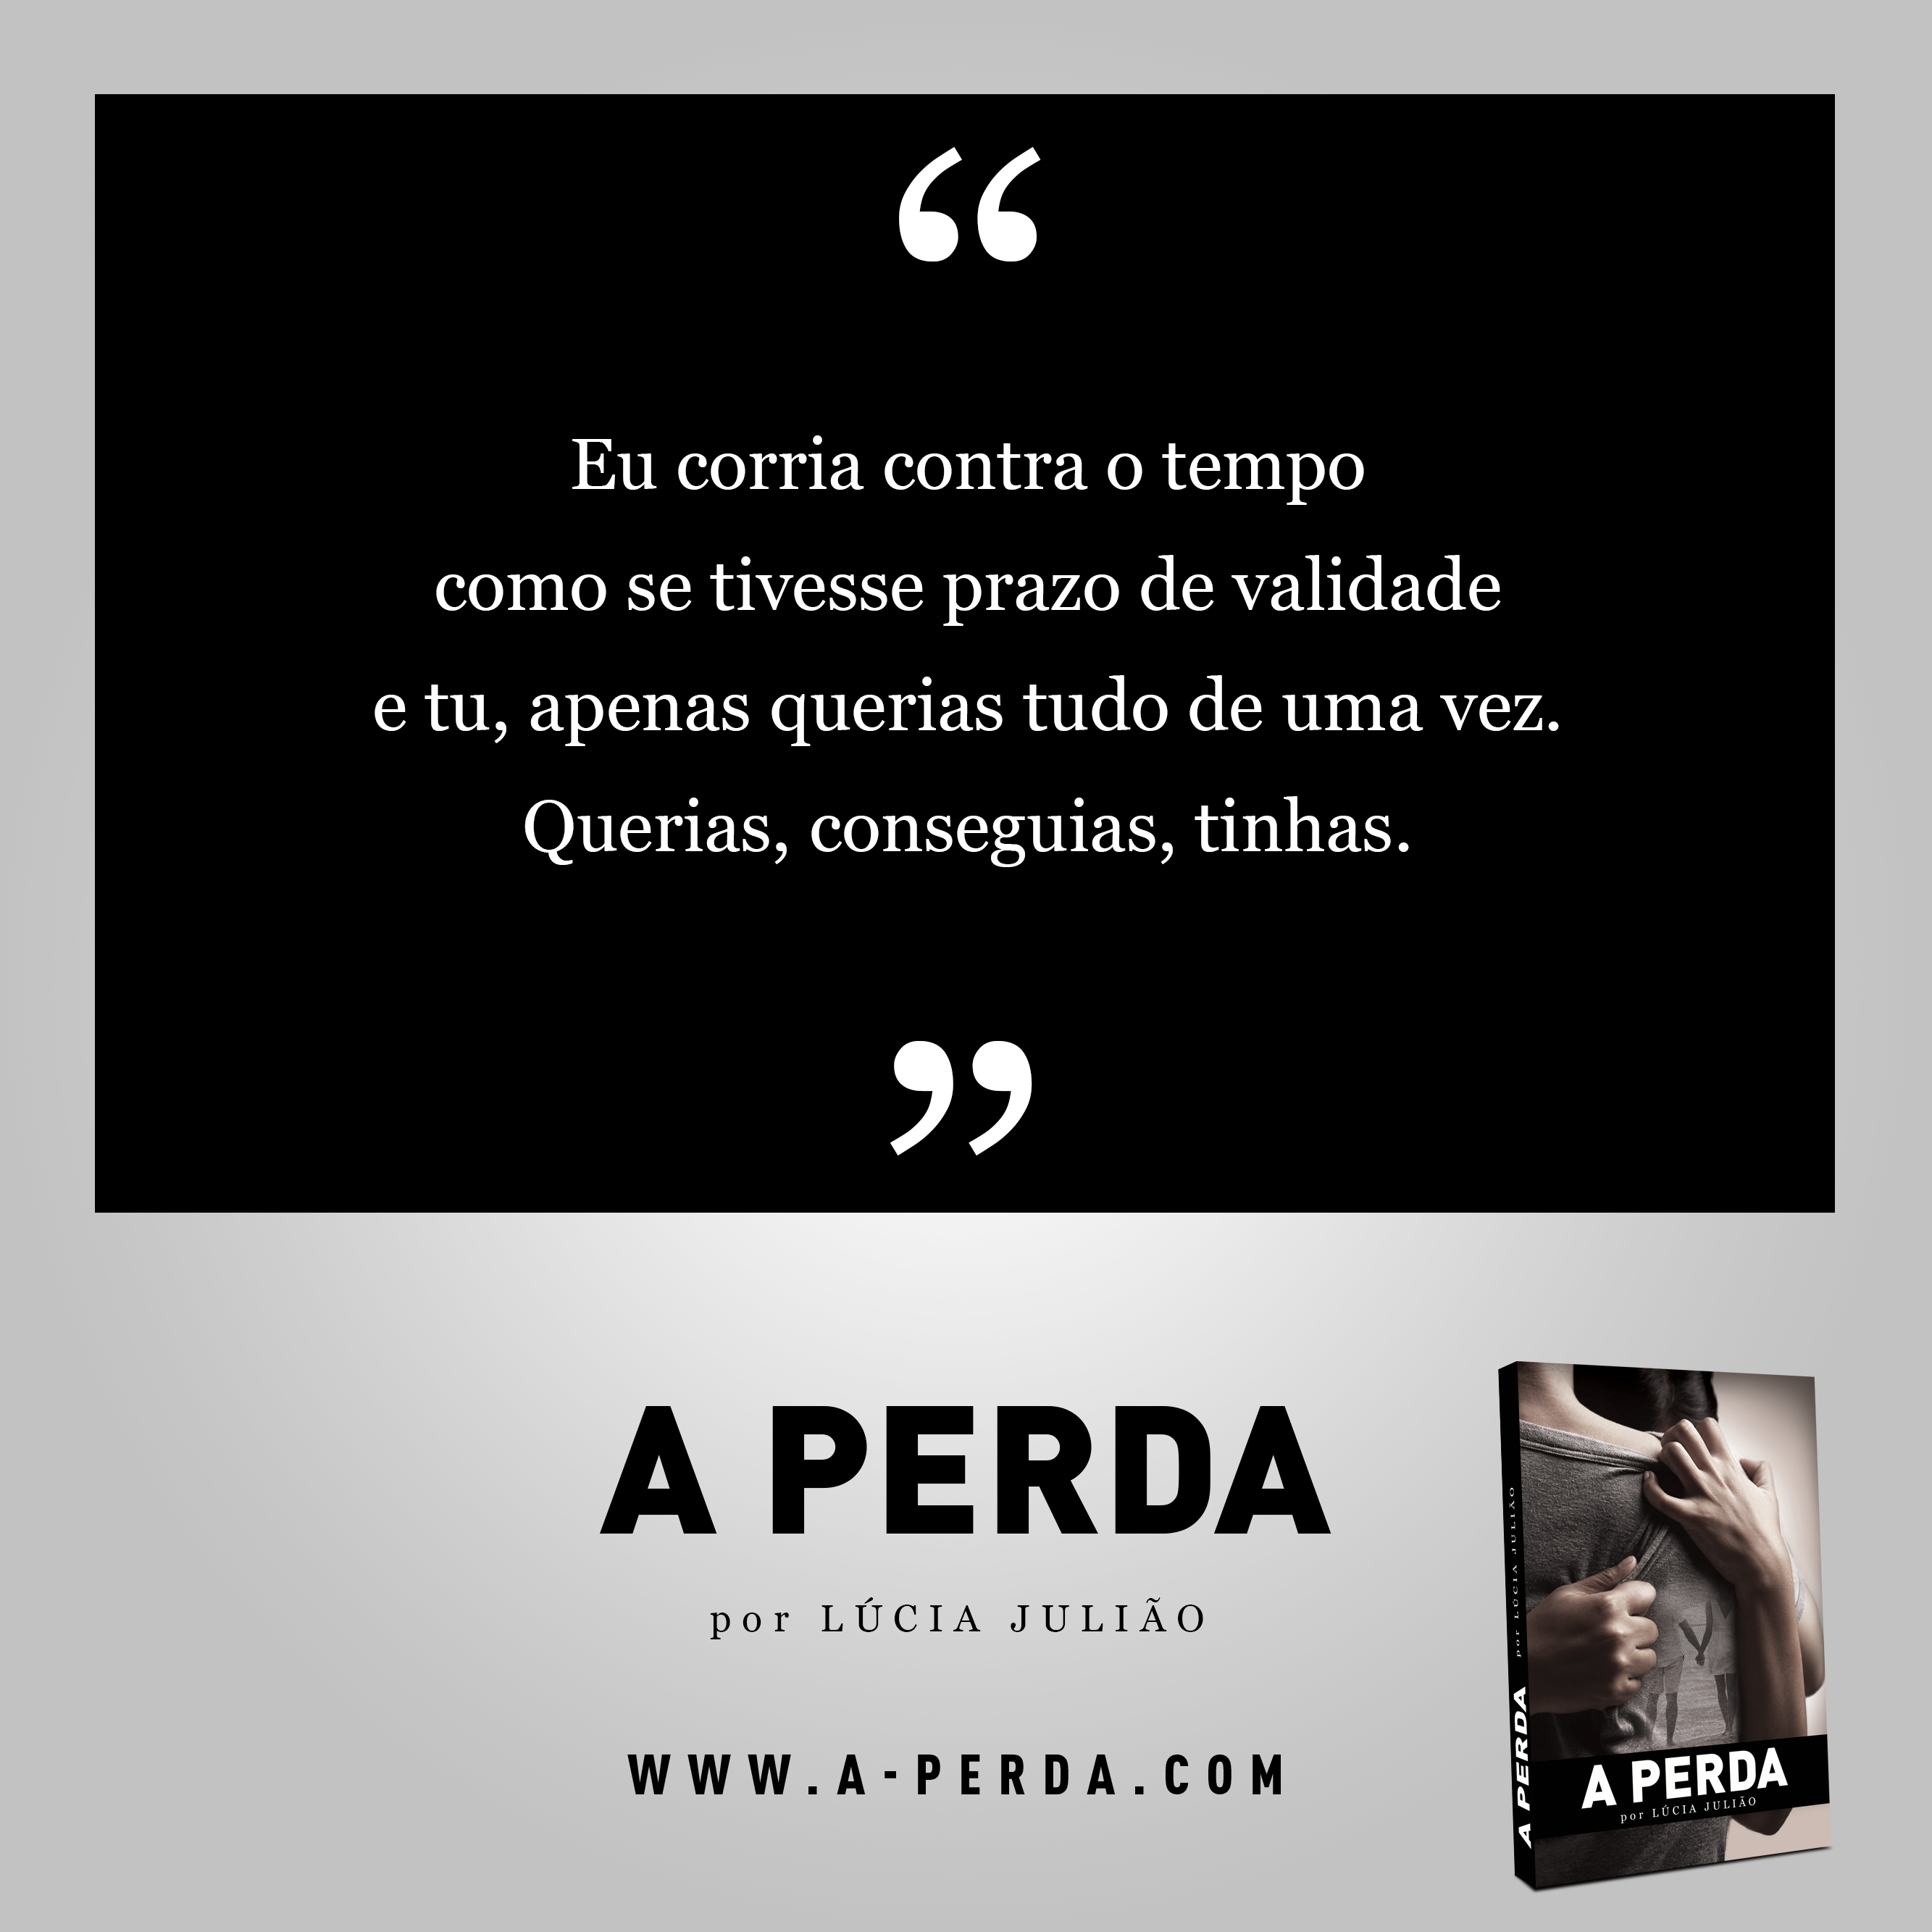 023-capitulo-12-livro-a-Perda-de-Lucia-Juliao-Instagram